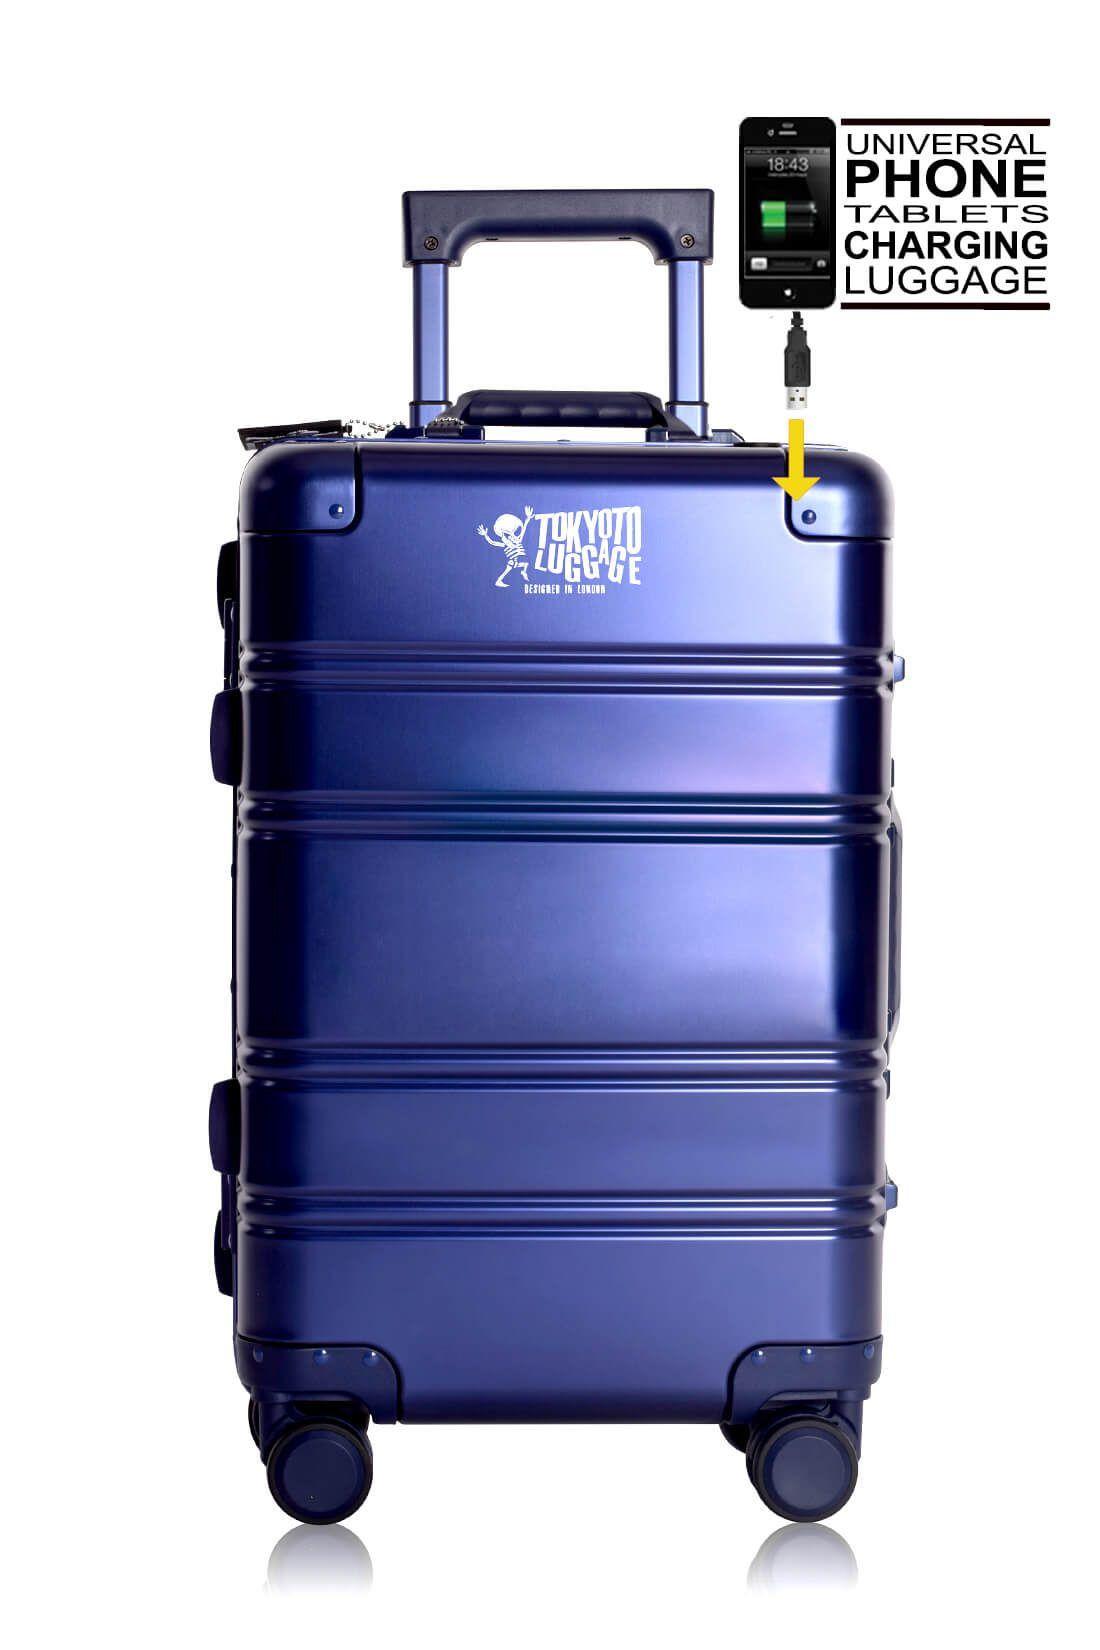 Valise Aluminium Online Cabine Trolley Avec Chargeur Powerbank TOKYOTO LUGGAGE Modelle BLUE LOGO 3